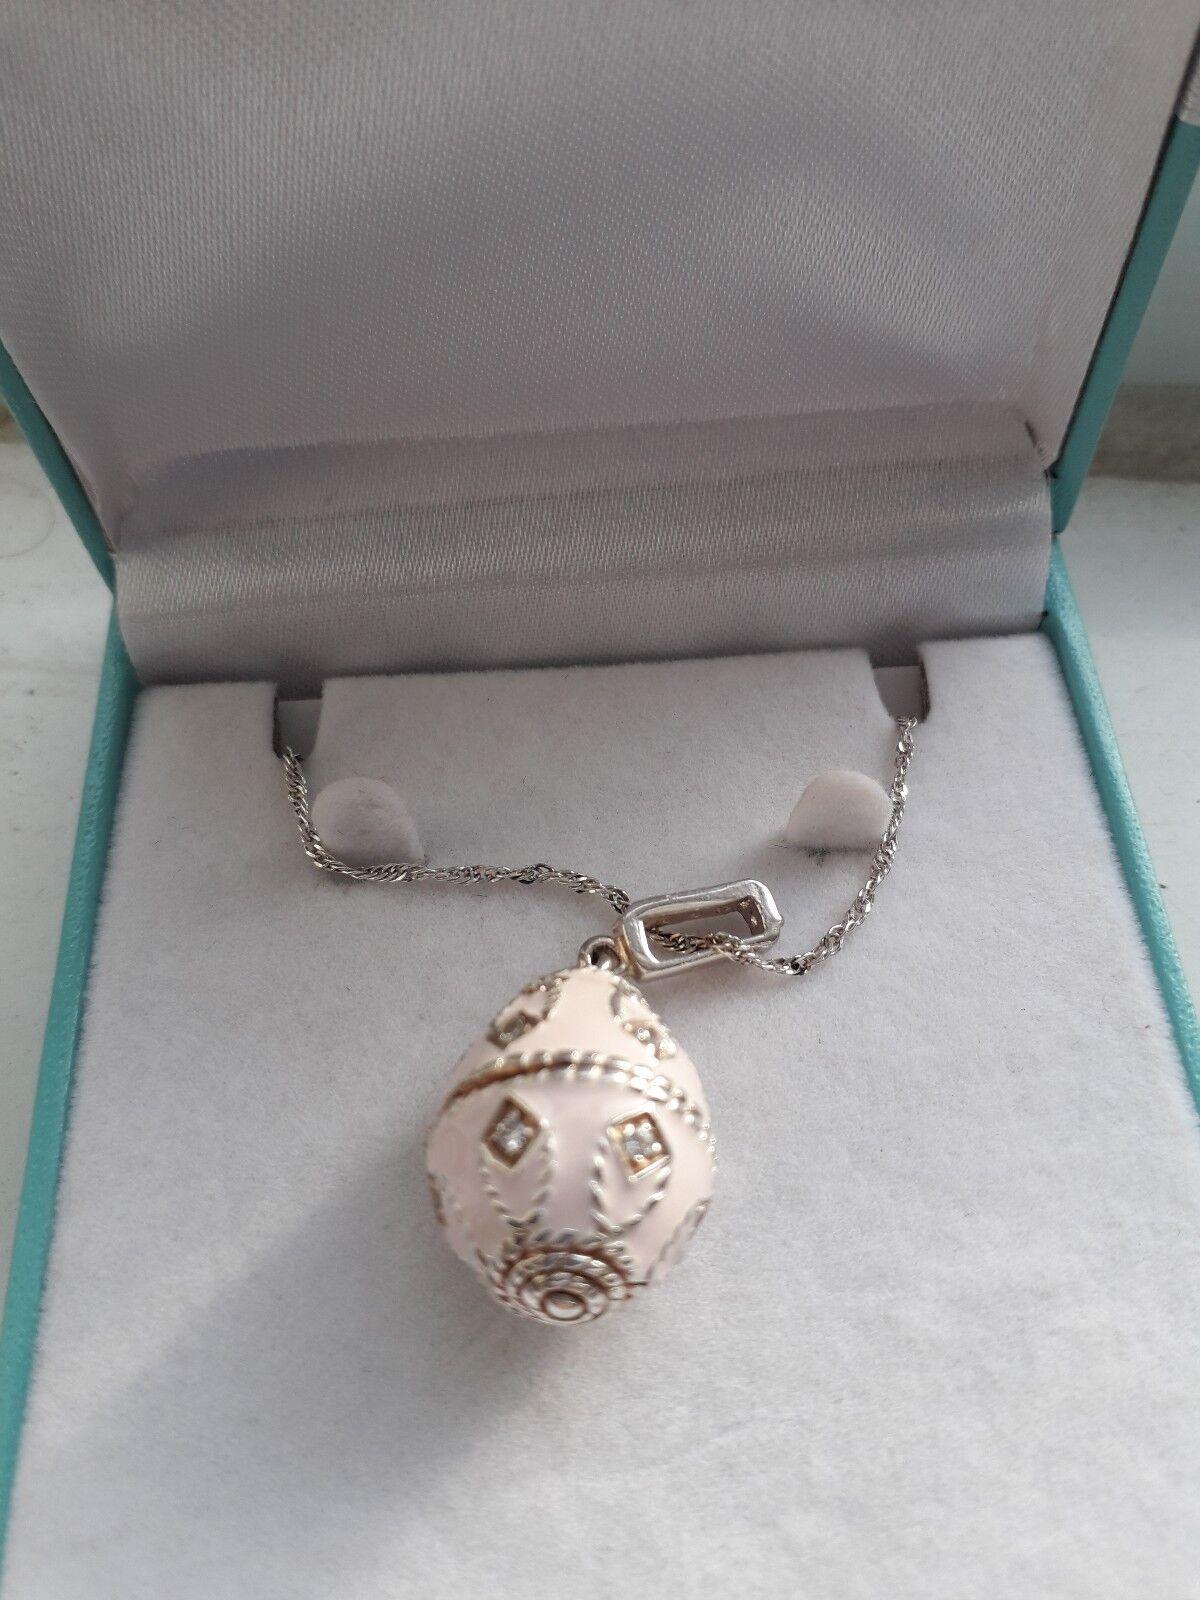 58F Donna argentoo Sterling rosa e Zirconi Cubici in Ceramica Ceramica Ceramica UOVO Collana 20 pollici 150239